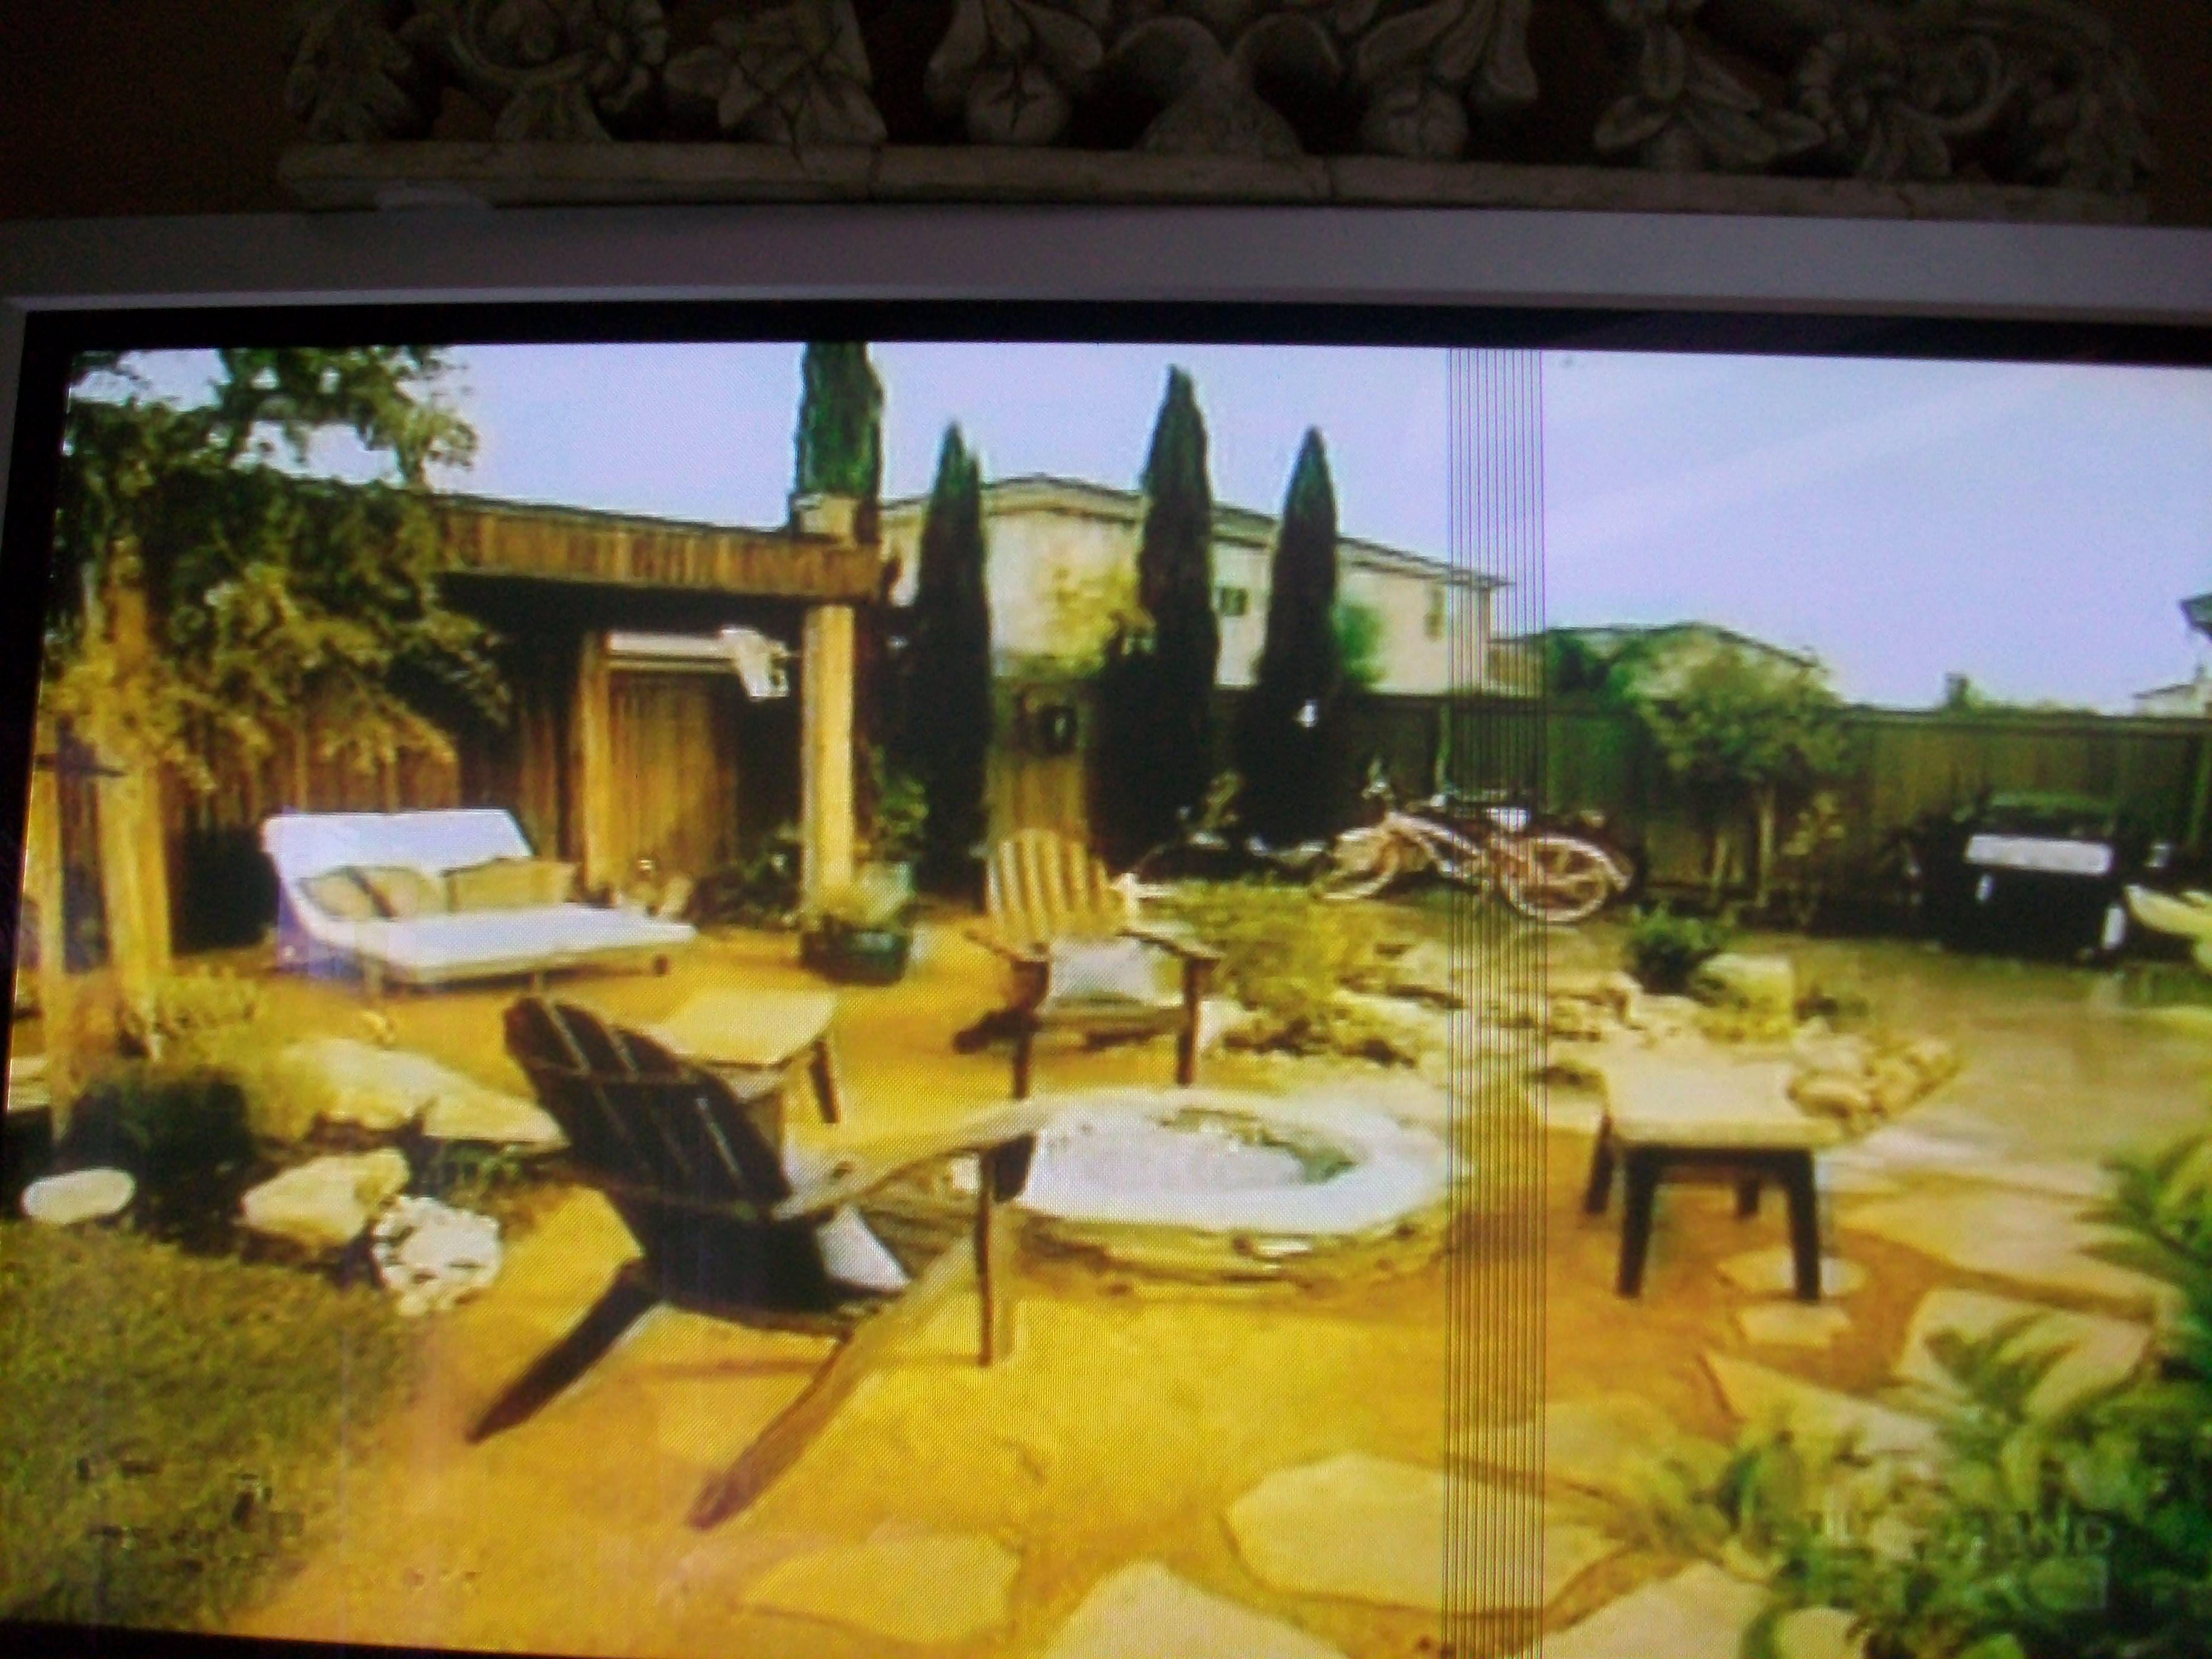 No Grass Backyard Pictures : no grass backyard  Home Decor that I love  Pinterest